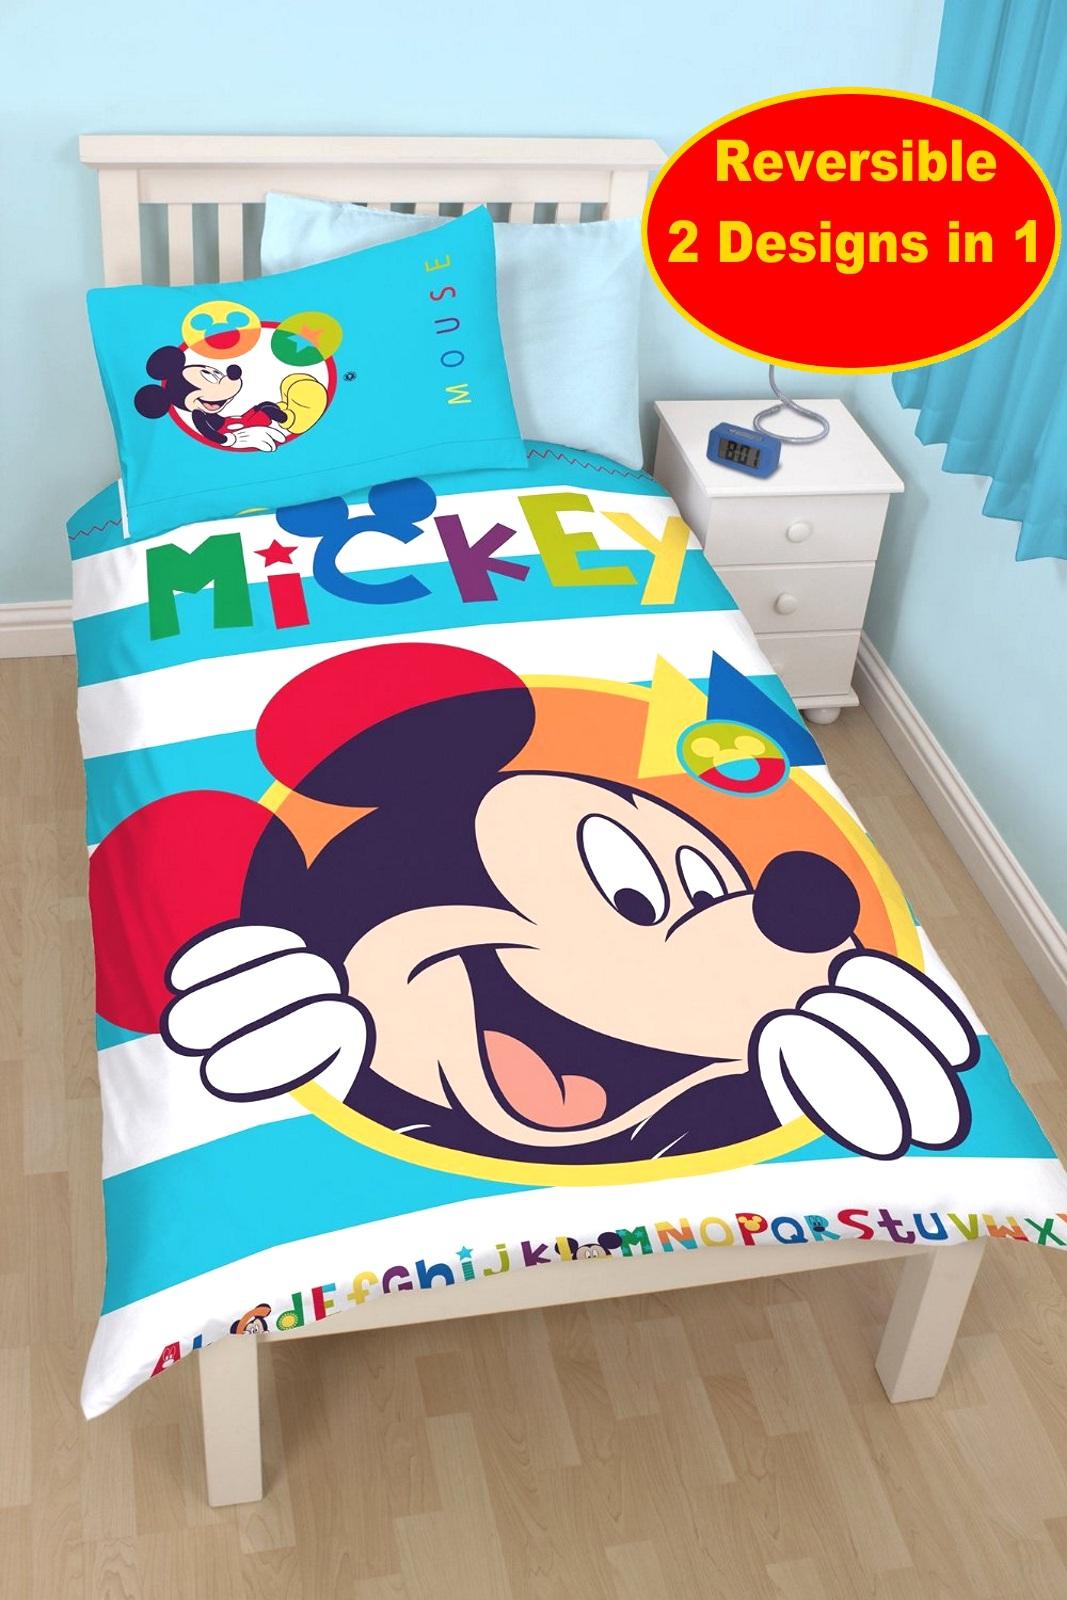 micky maus boo einzeln bettdecke bettbezug set mit zappar. Black Bedroom Furniture Sets. Home Design Ideas